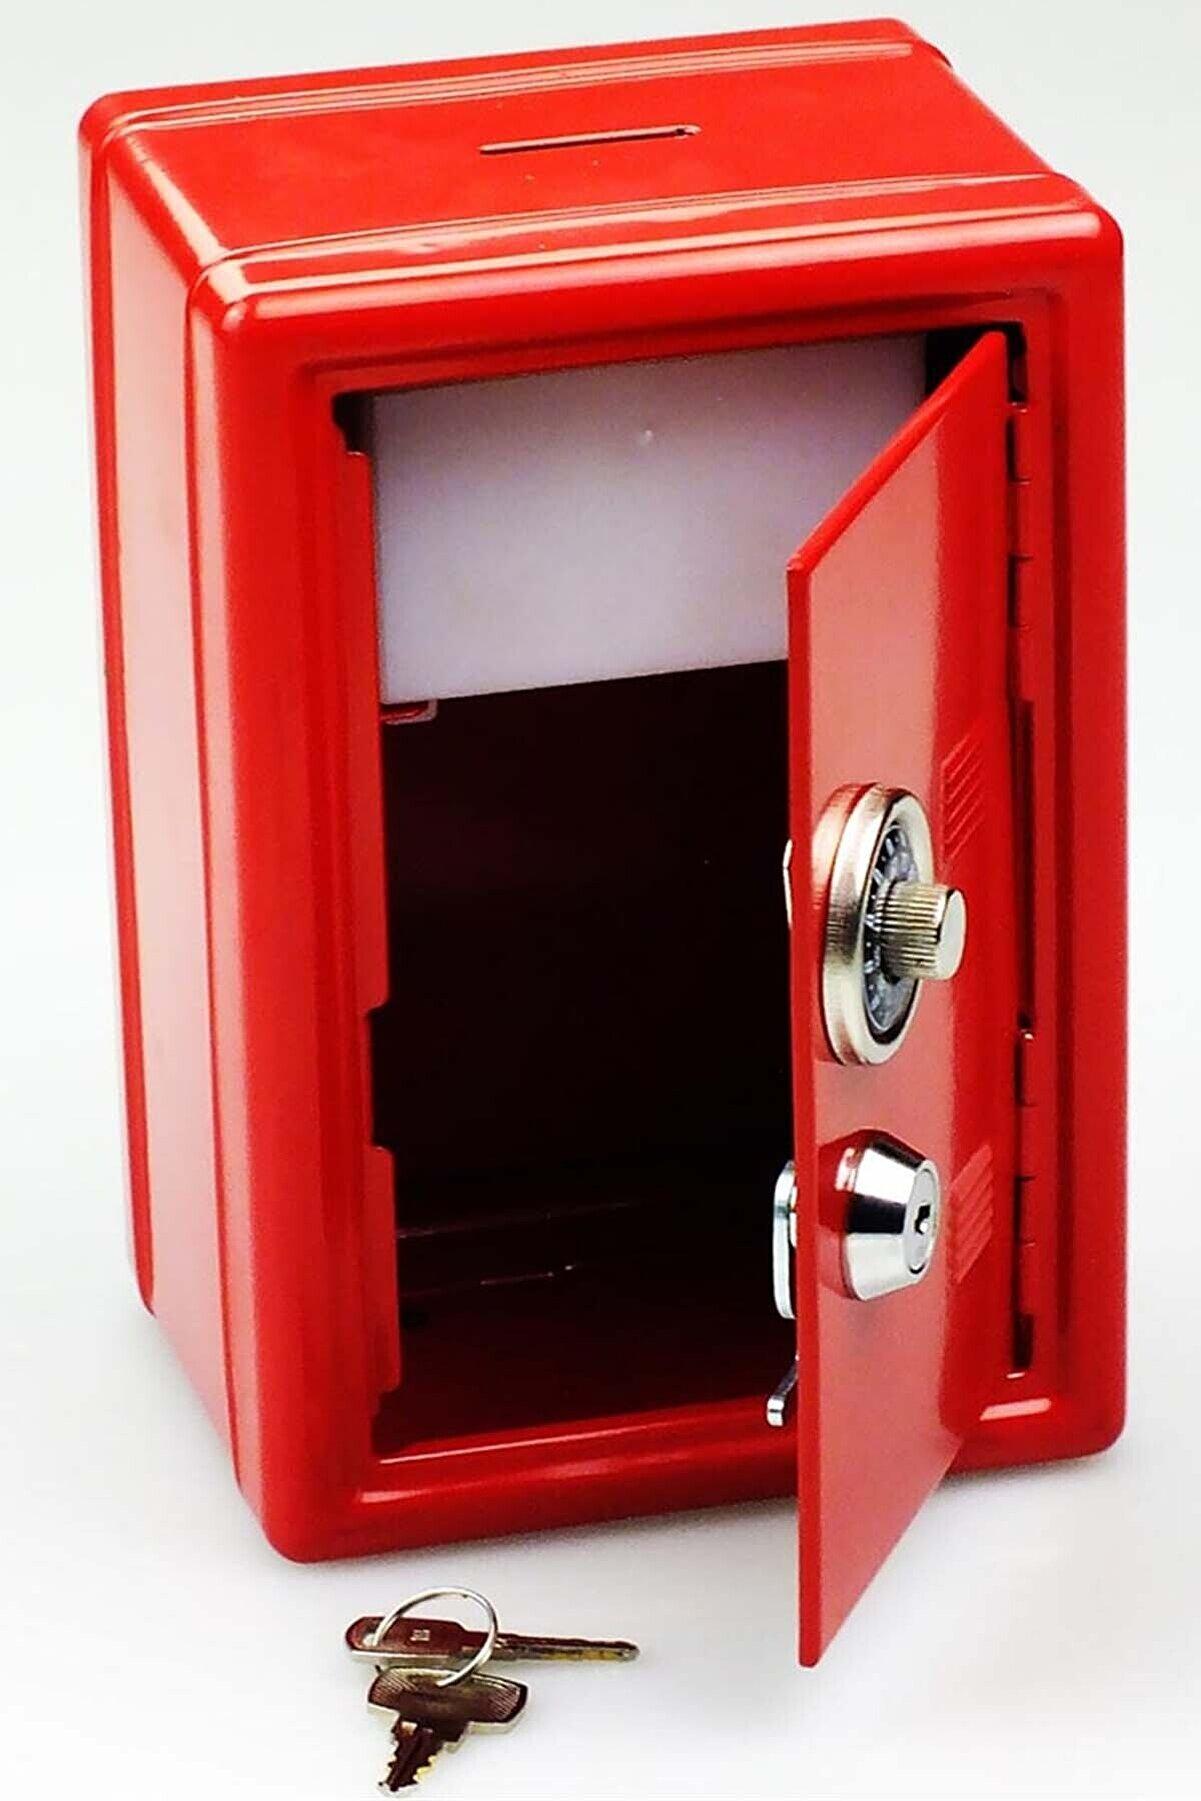 Mobee Kilitli Kasa Kumbara Anahtarlı Mini Metal Para Kasası